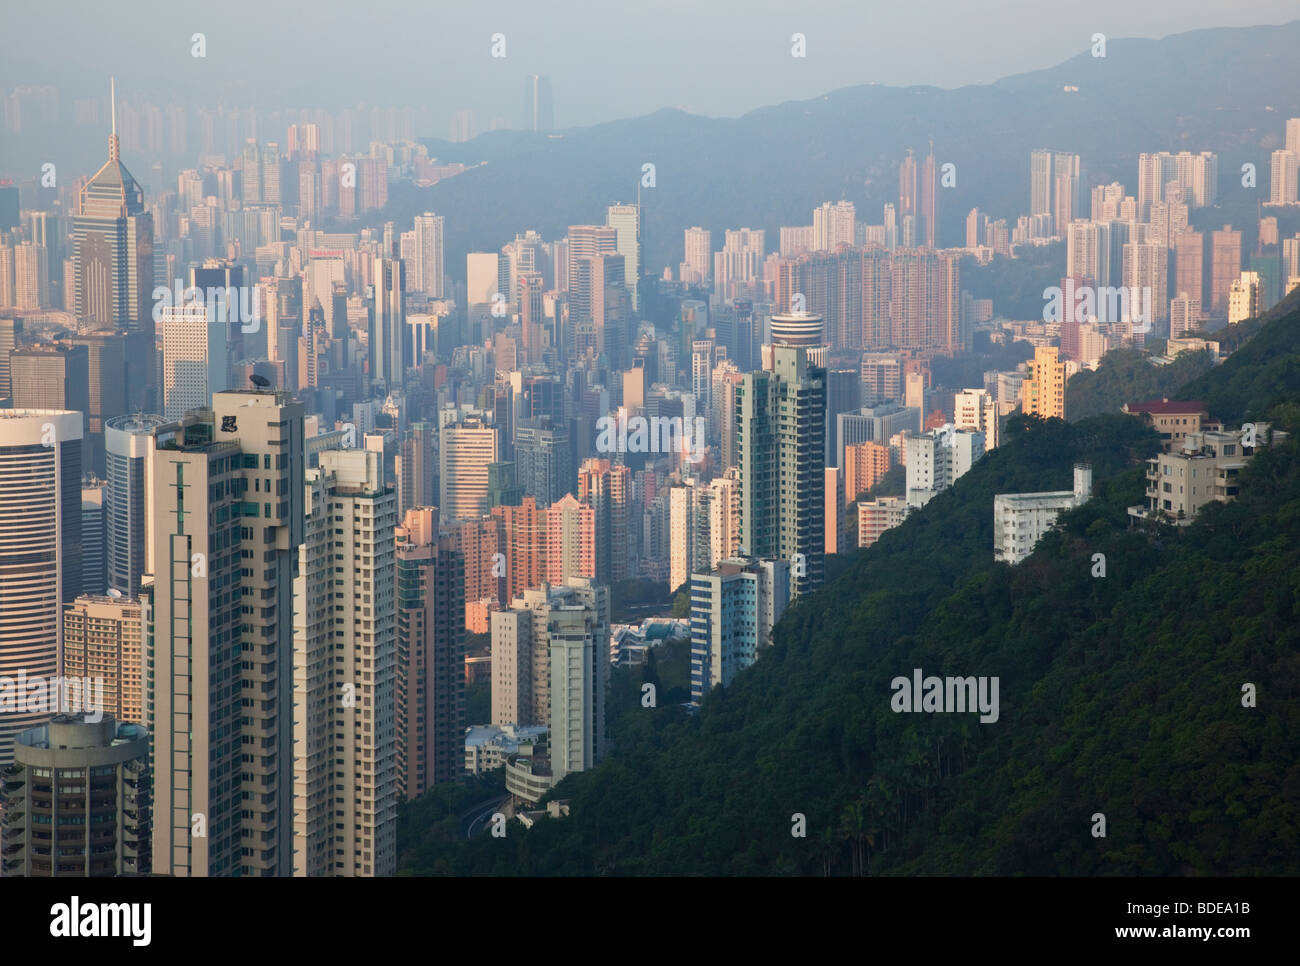 Vistas desde la cima, Shan Teng, Hong Kong, China. Imagen De Stock